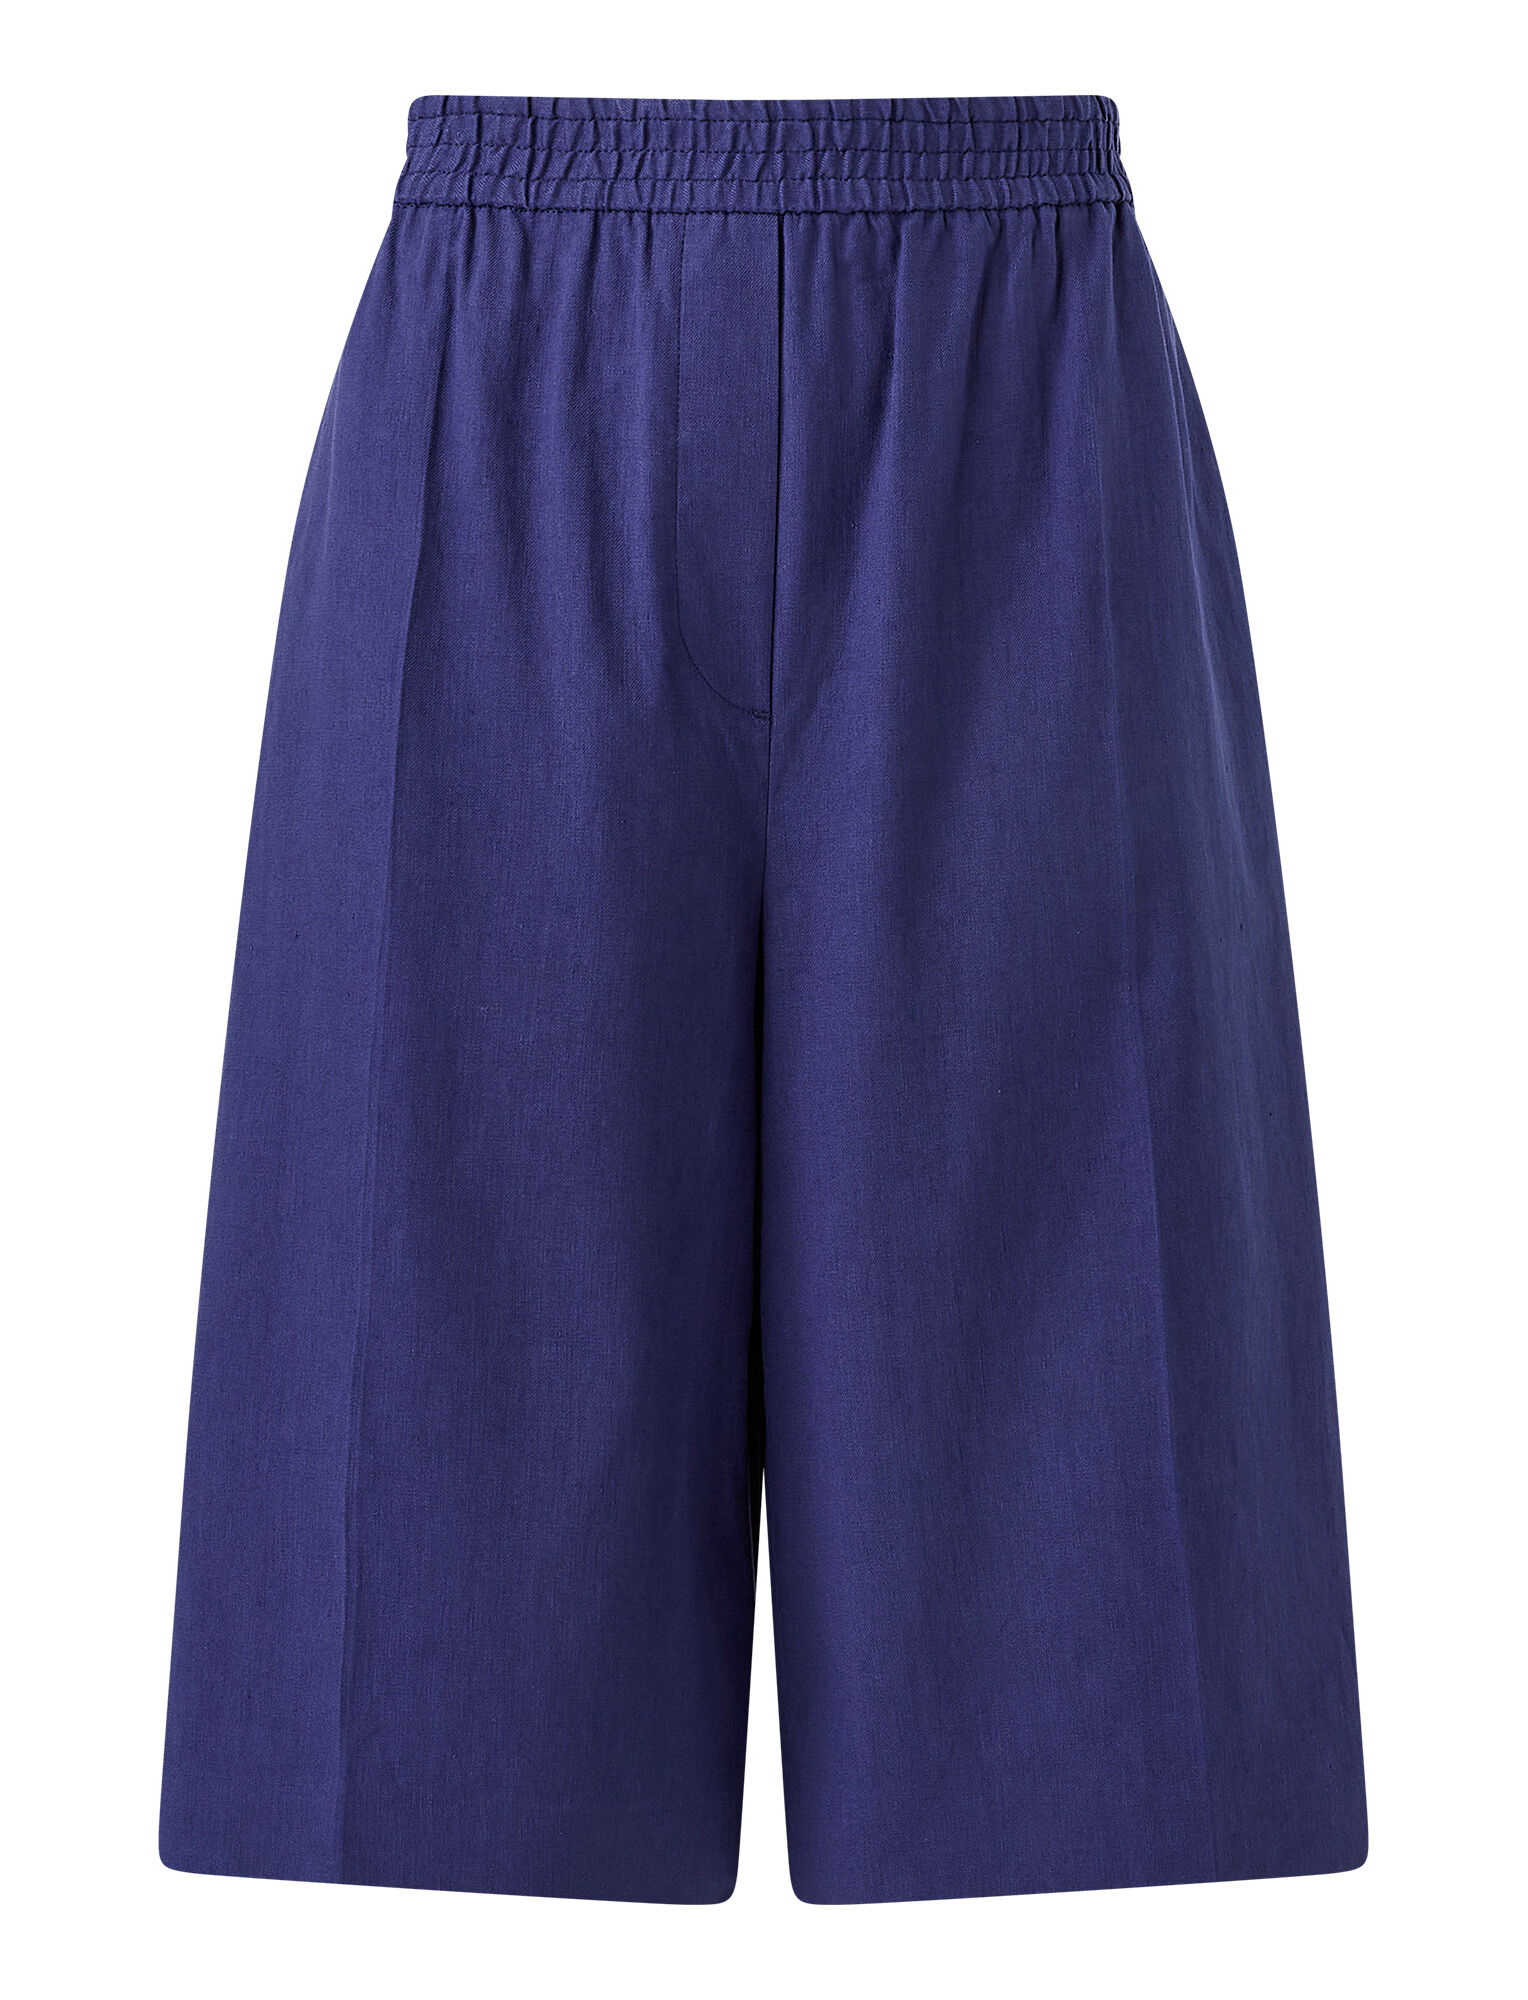 Joseph, Stretch Linen Cotton Tan Shorts, in COBALT BLUE